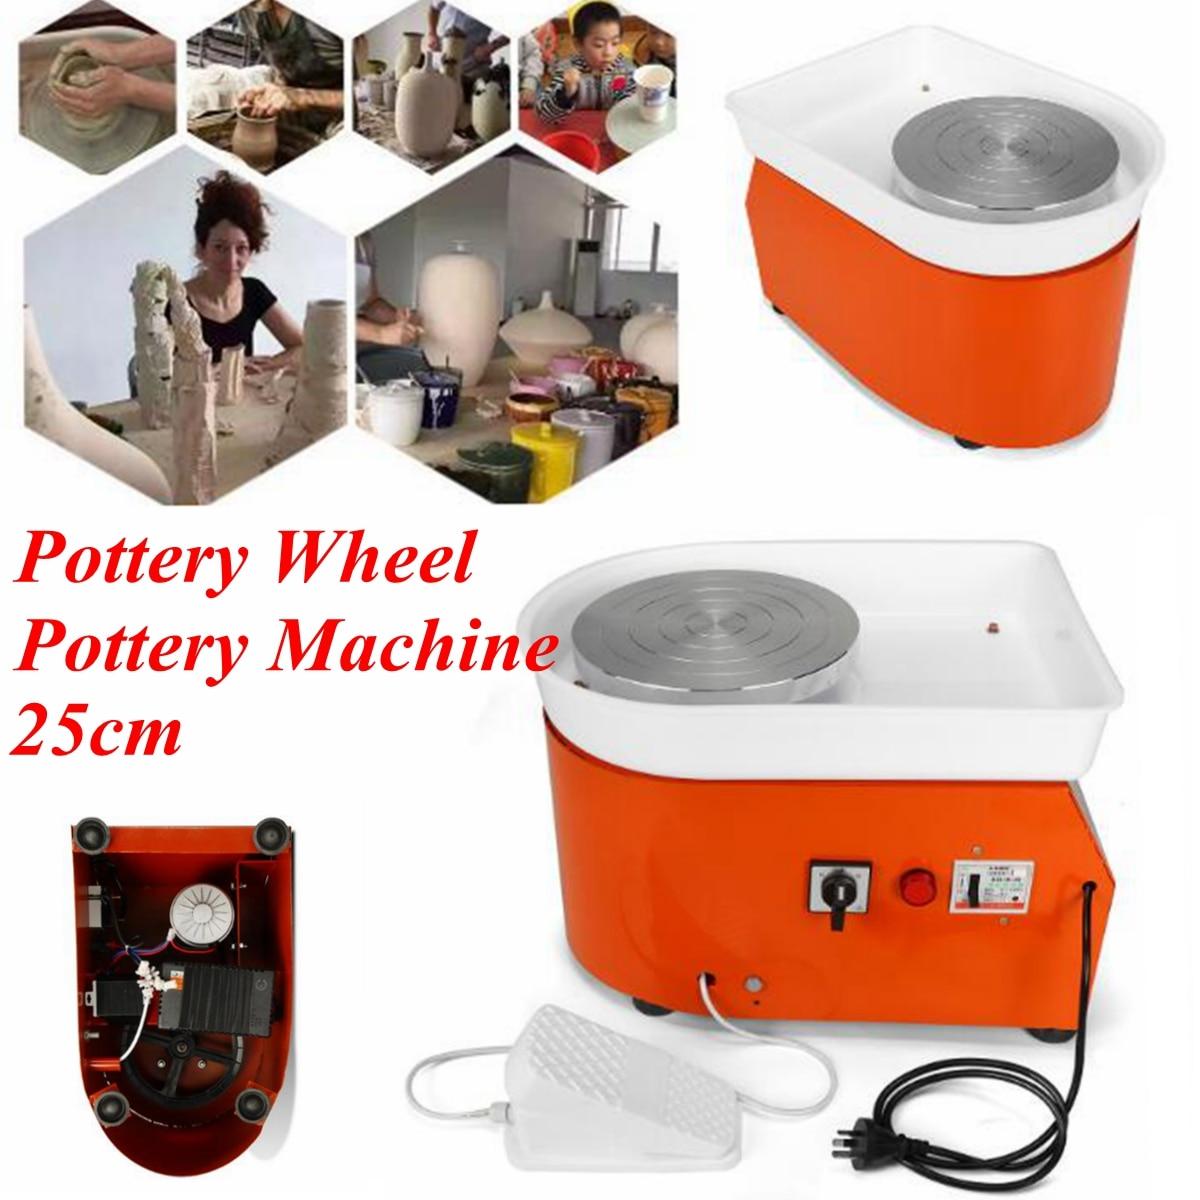 Pottery Wheel Machine 25cm AC 220V 250W Flexible Foot Pedal Ceramic Work Ceramics Clay Art EU/AU/US With Mobile Smooth Low Noise